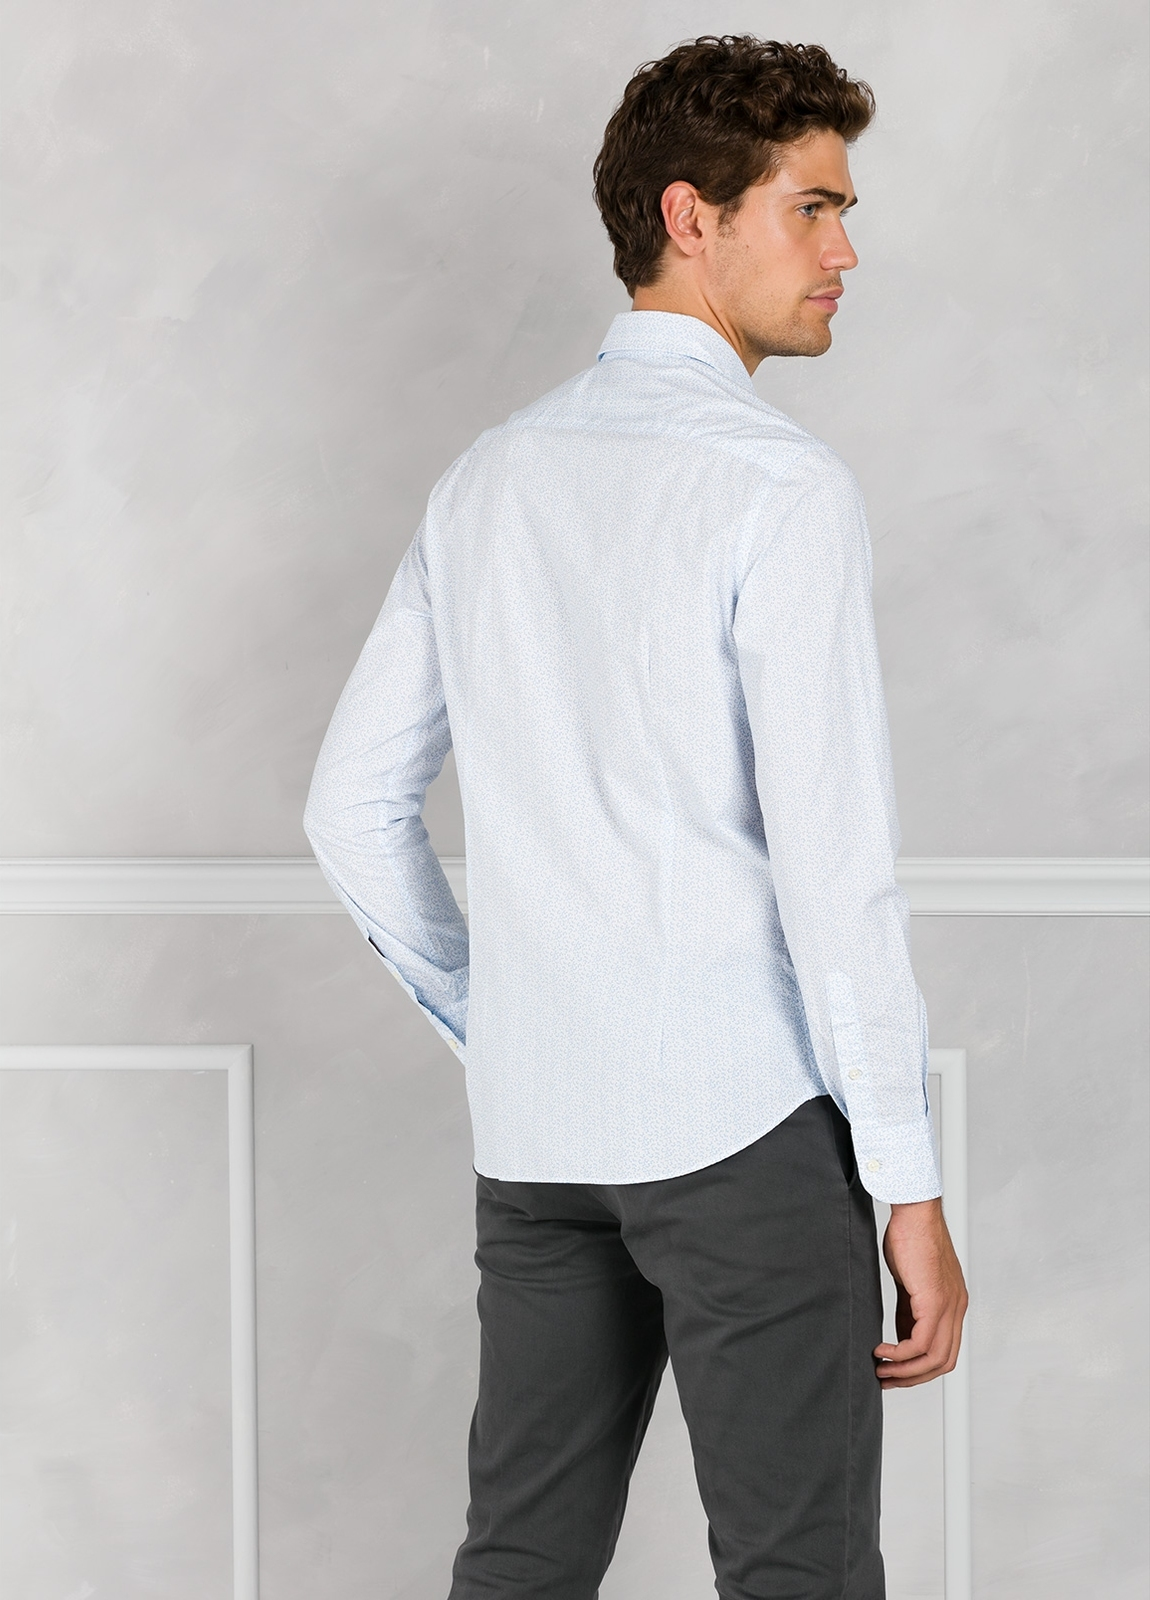 Camisa Leisure Wear SLIM FIT modelo PORTO micro dibujo color celeste. 100% Algodón. - Ítem2